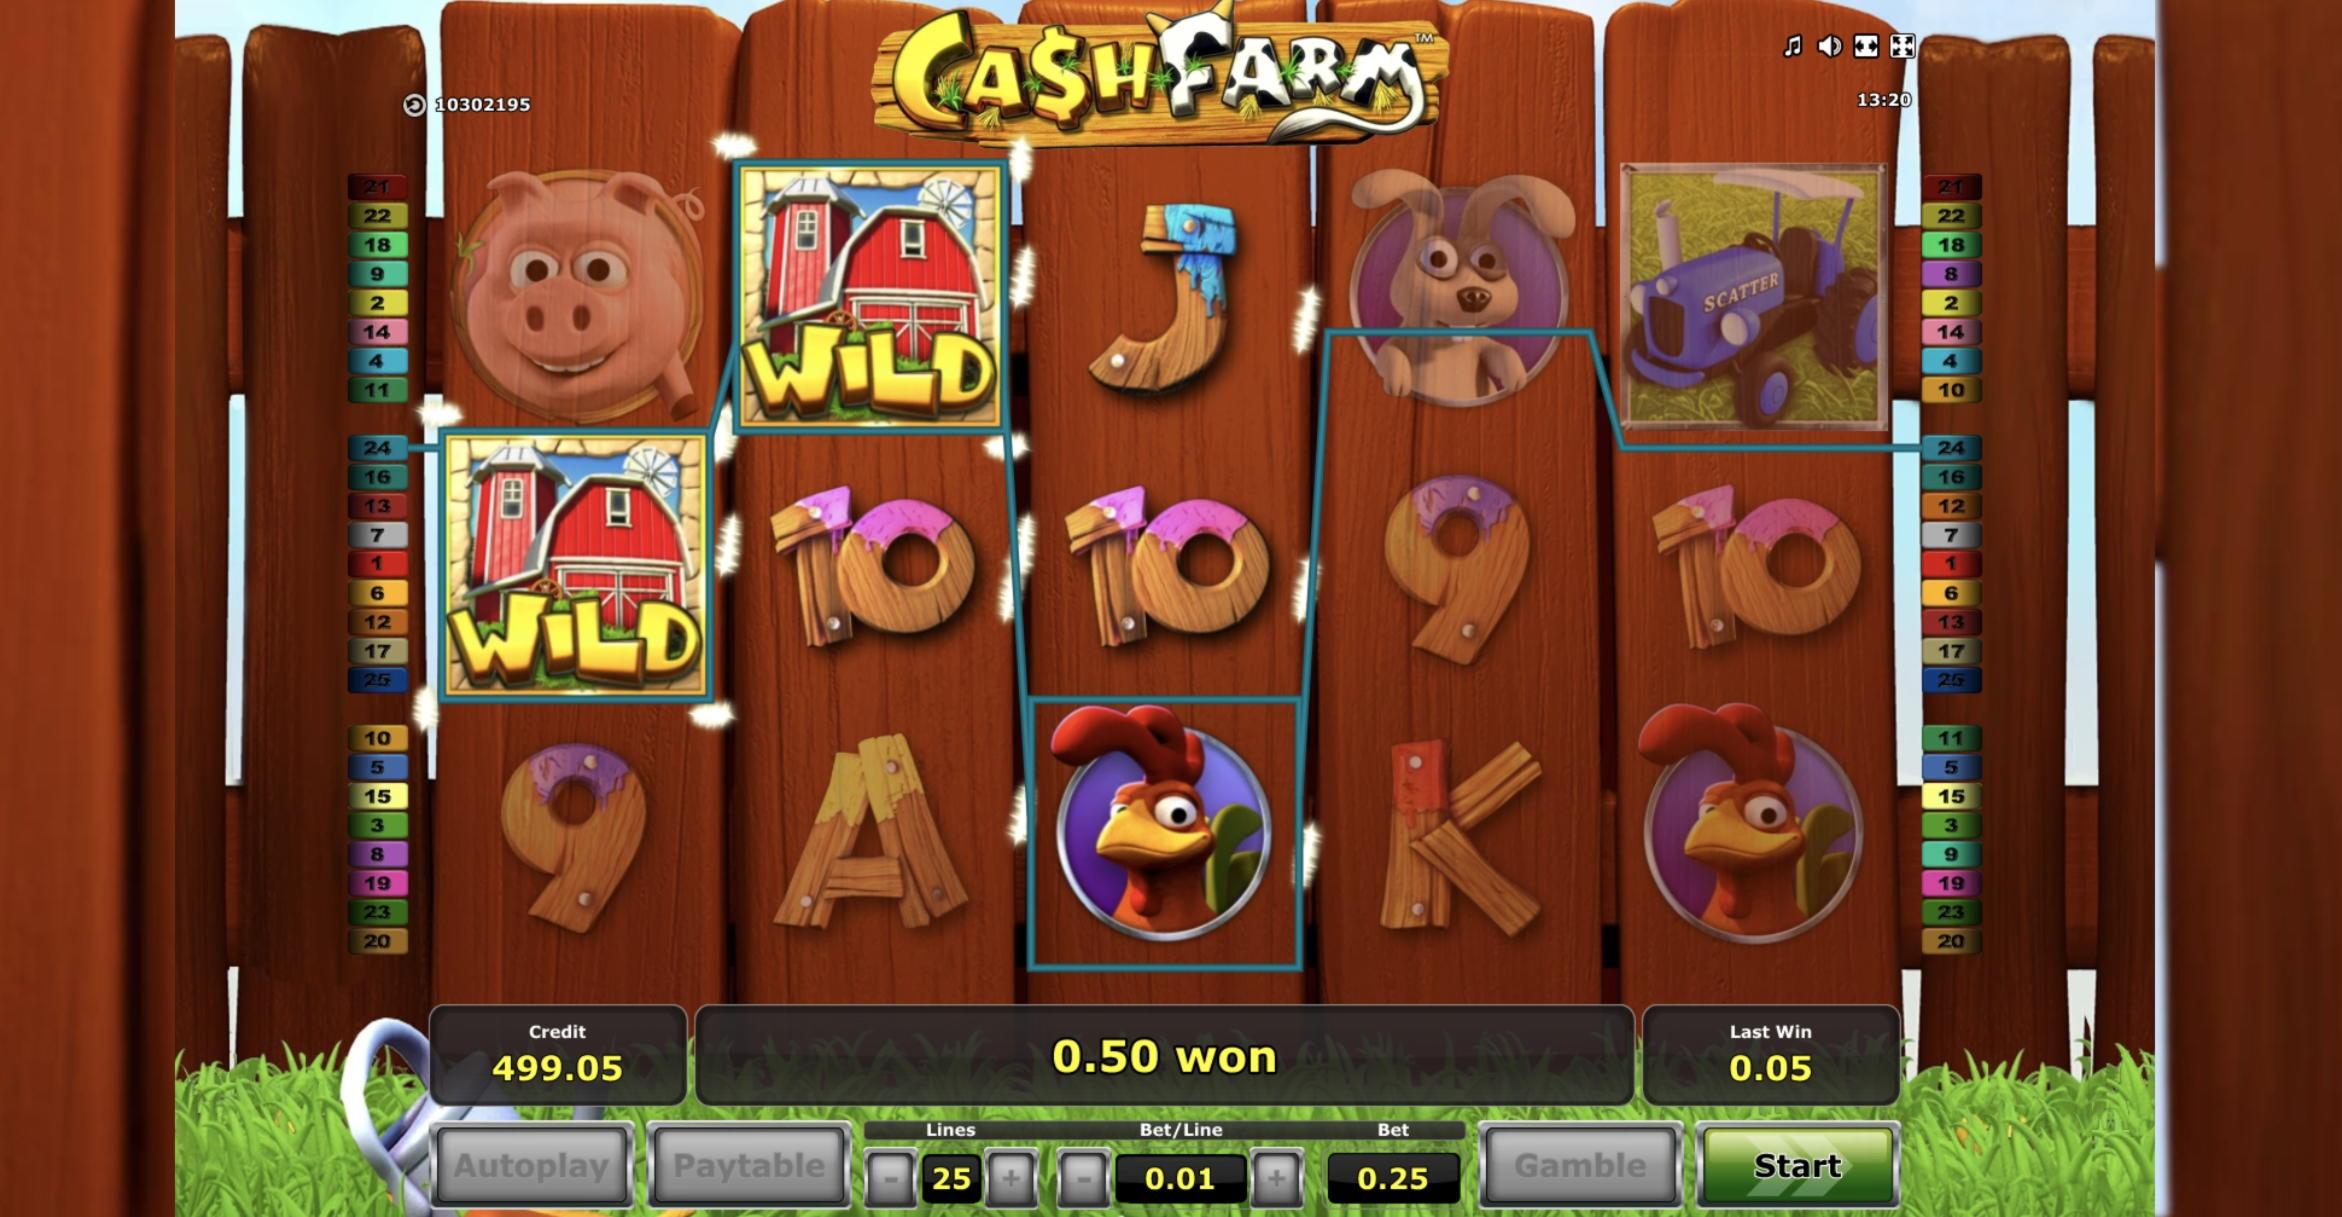 EURO 4525 Intet depositum hos Dunder Casino